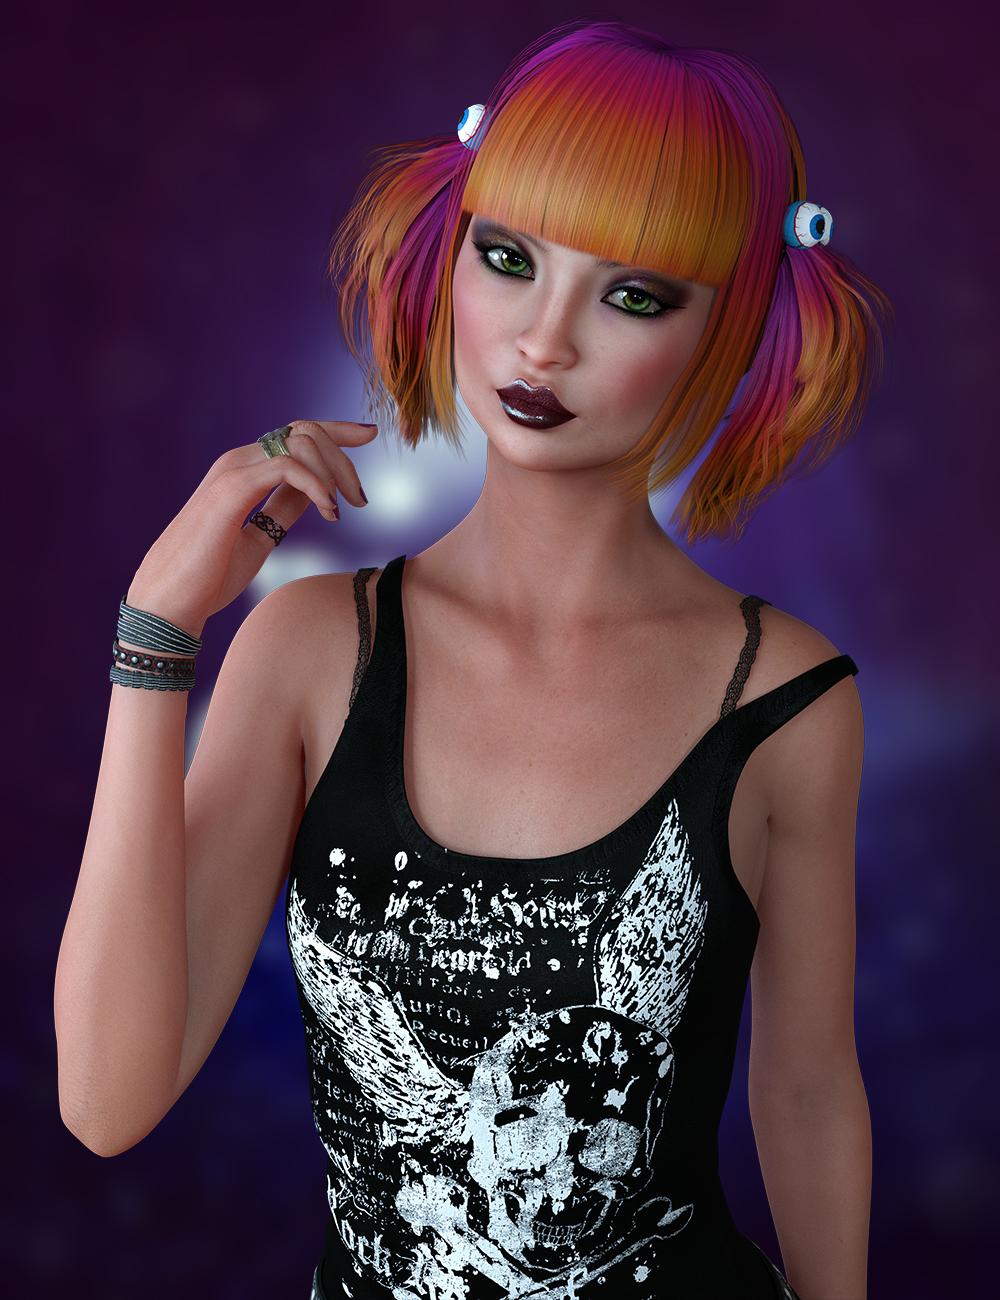 Kikury for Genesis 8 Female by: hotlilme74, 3D Models by Daz 3D